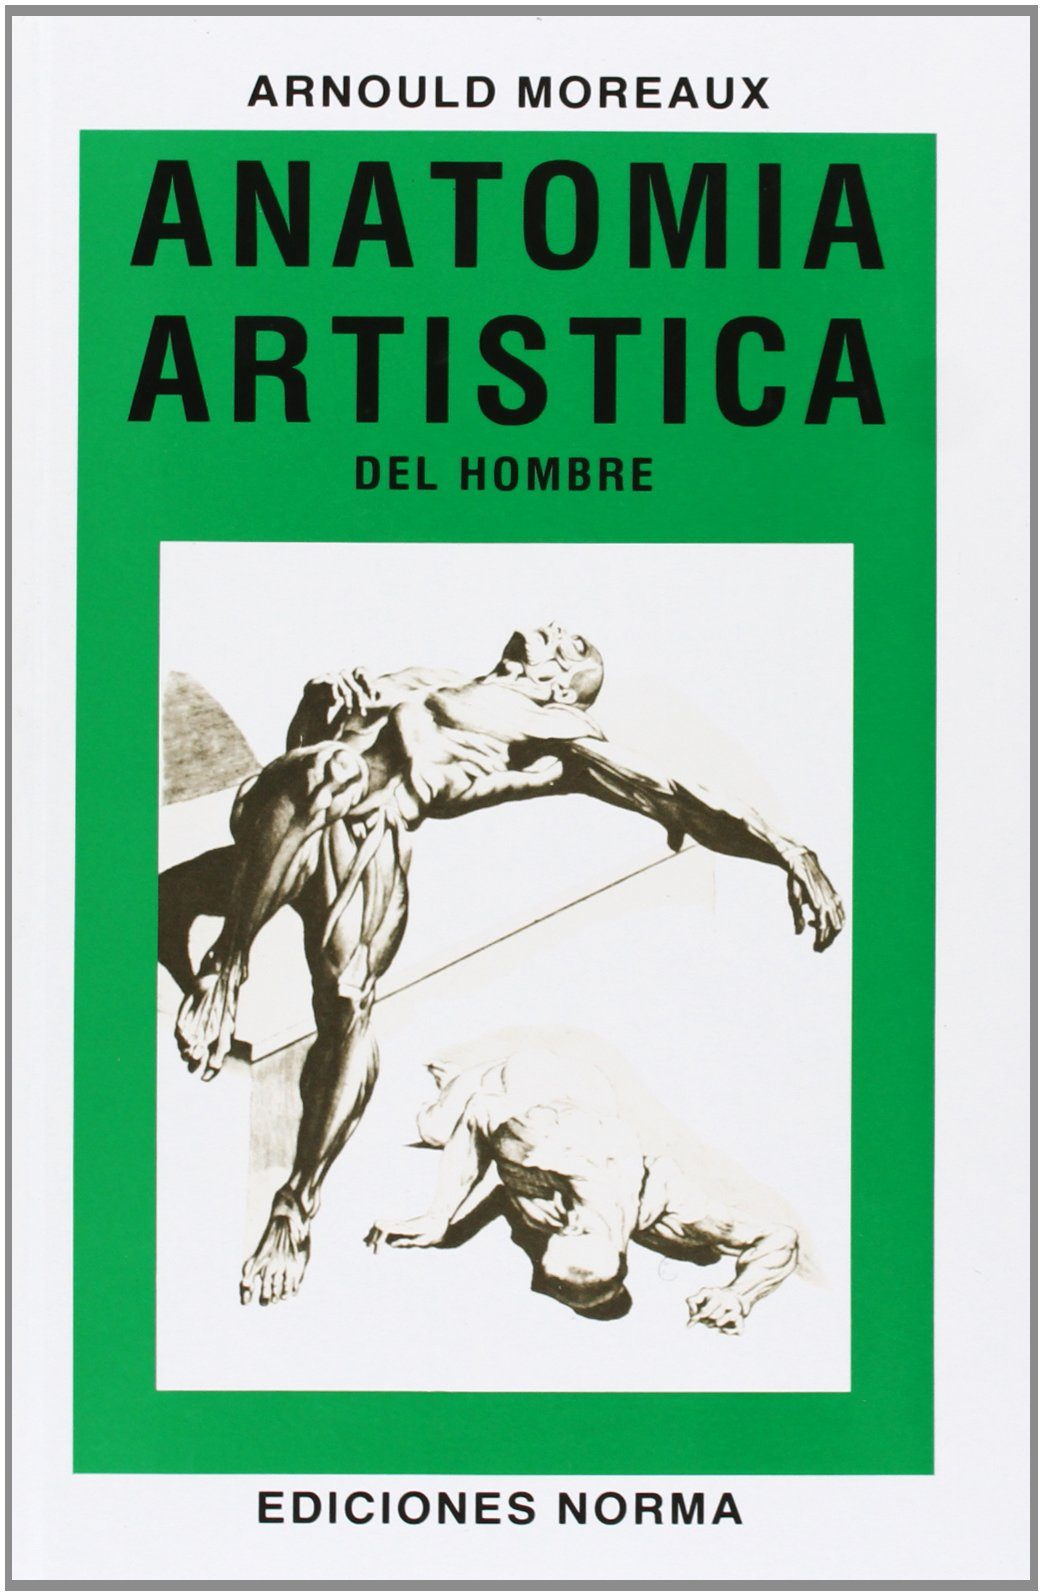 ANATOMIA ARTISTICA DEL HOMBRE | JEAN LAMOREAUX | Comprar libro ...